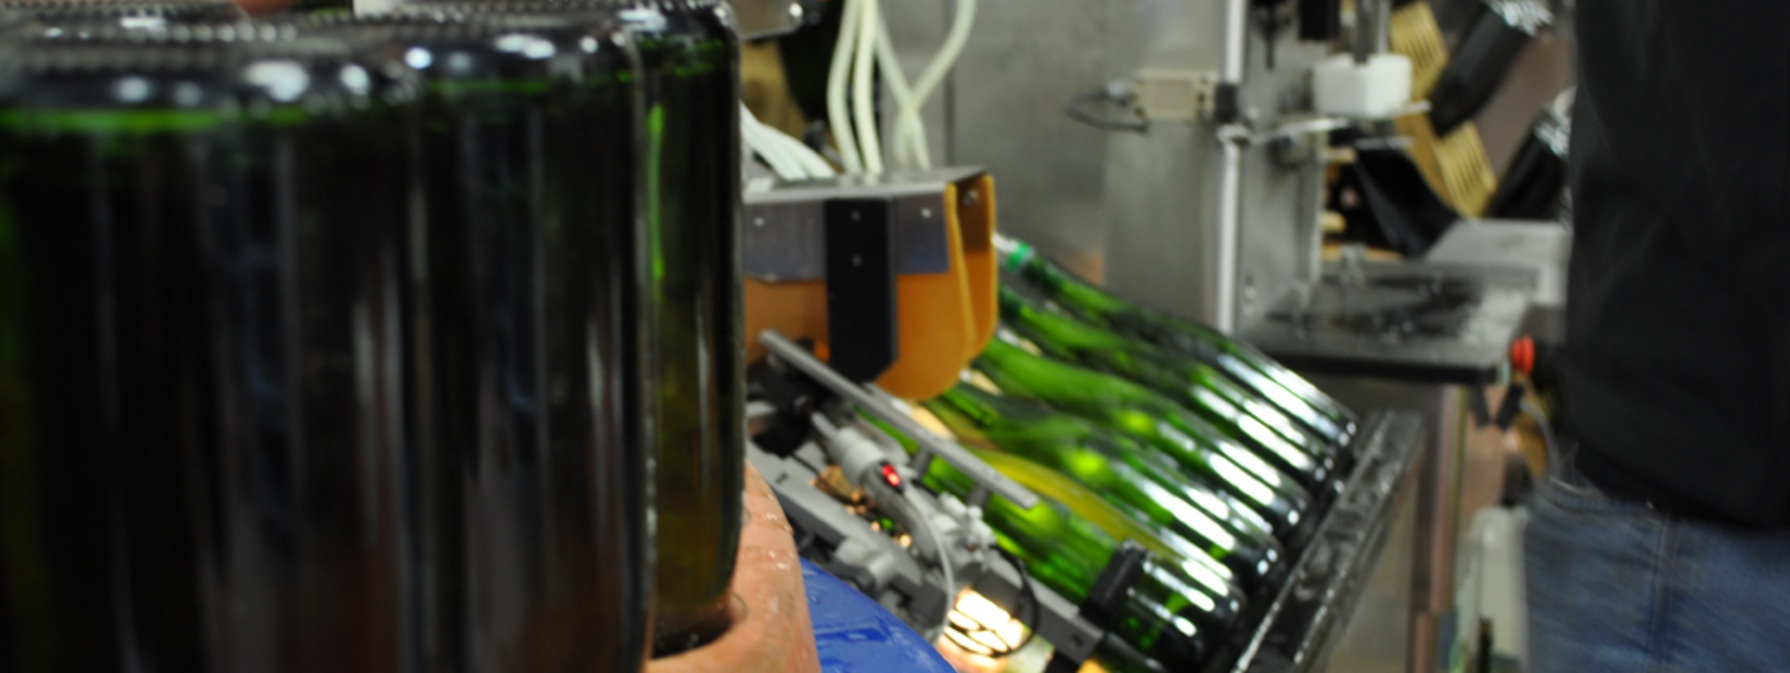 Hattingley Valley English Wine Bottling